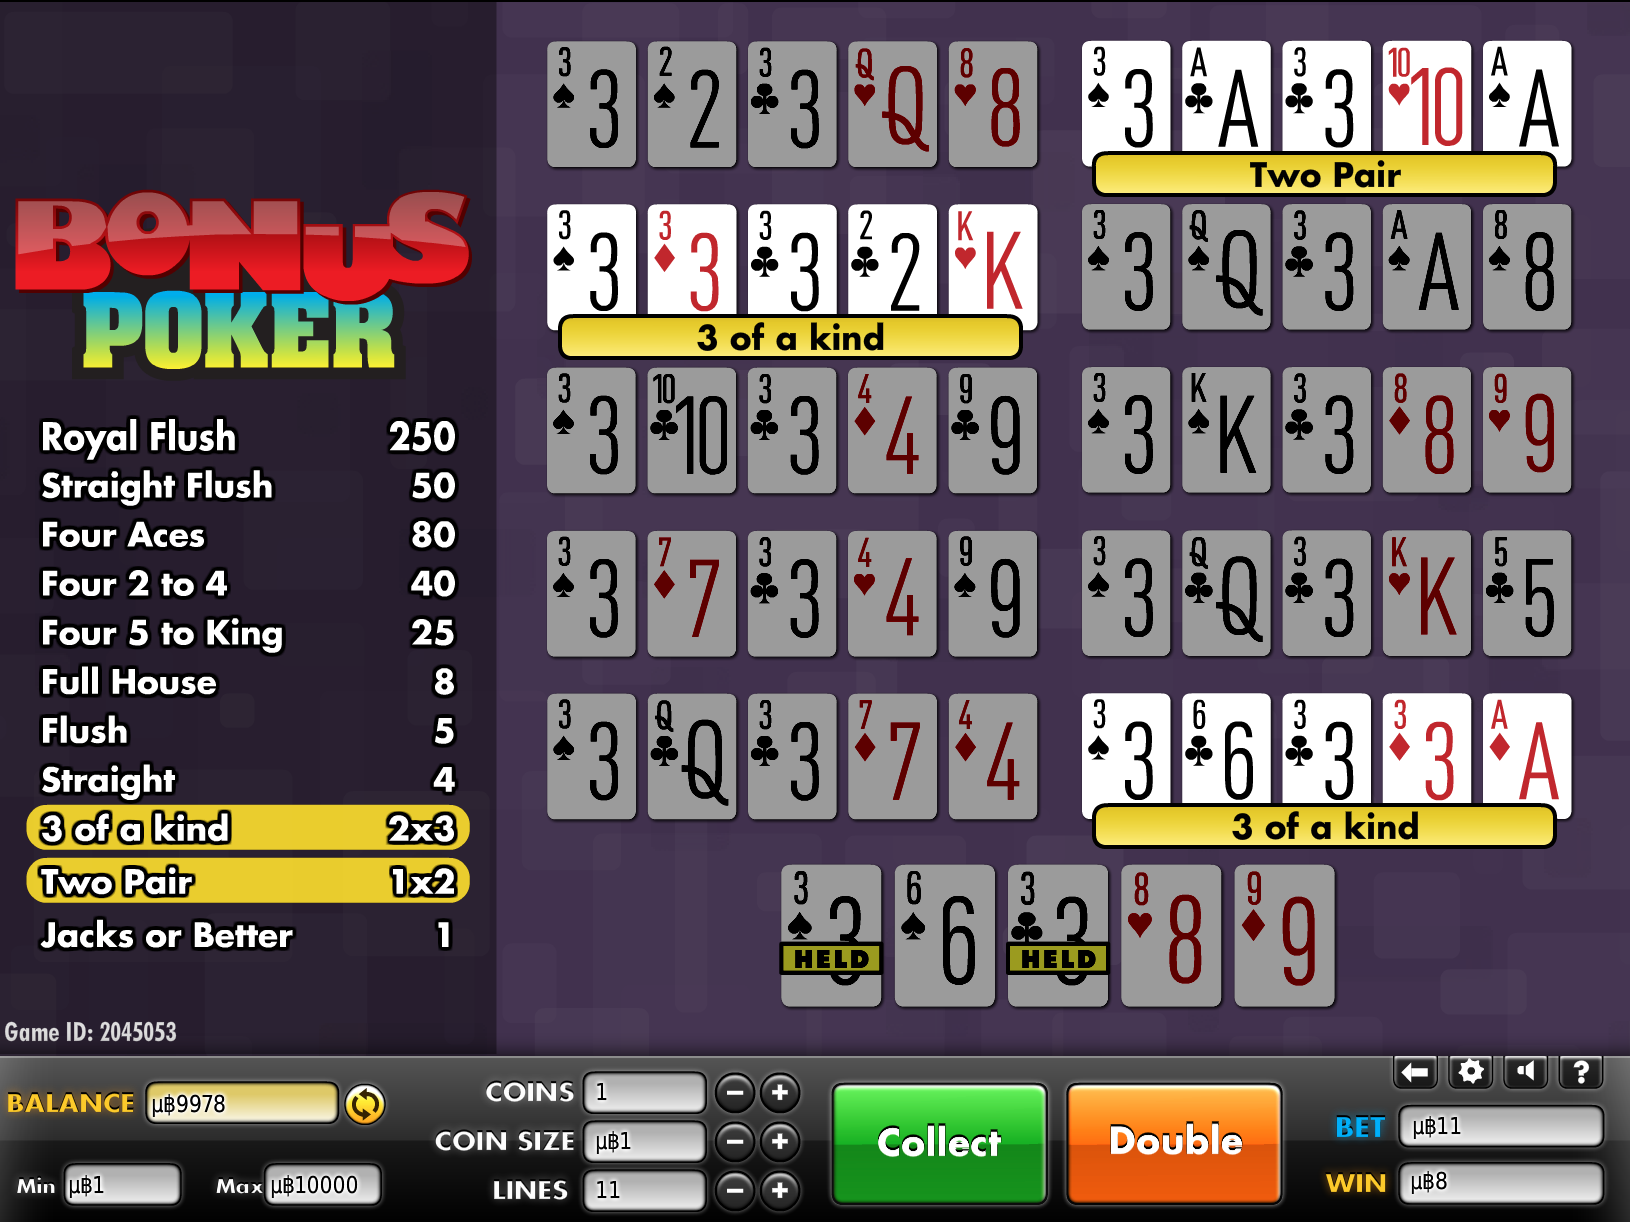 Bonus poker strategy on Bspin.io